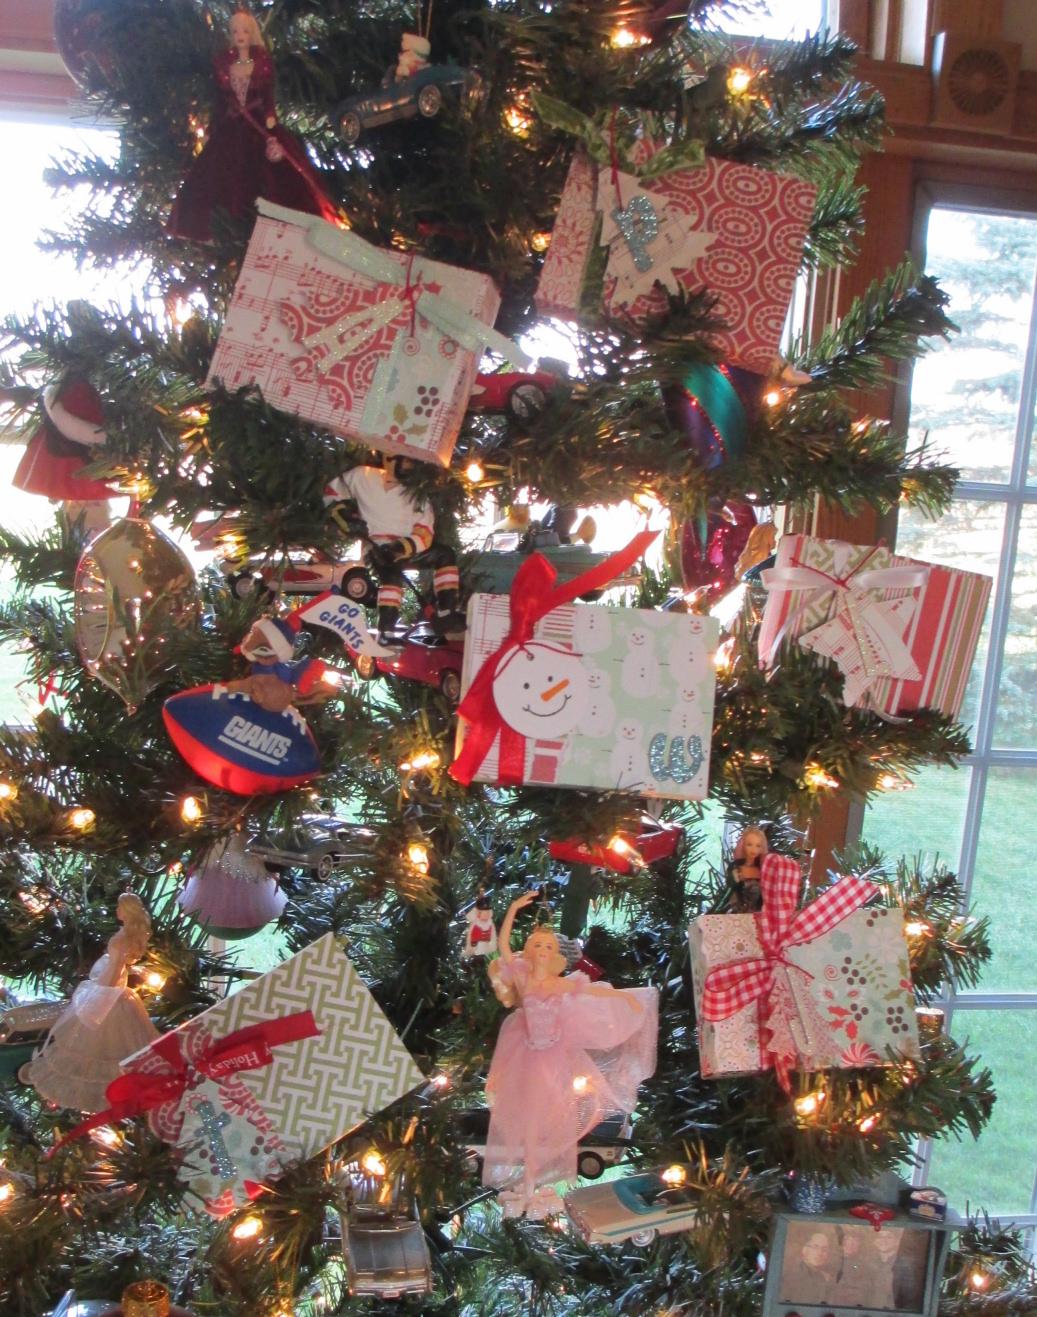 http://4.bp.blogspot.com/-p08boevgzwA/UMjfIcdz15I/AAAAAAAAA6E/x-te0_MNEvk/s1600/Tree+with+Boxes.jpg